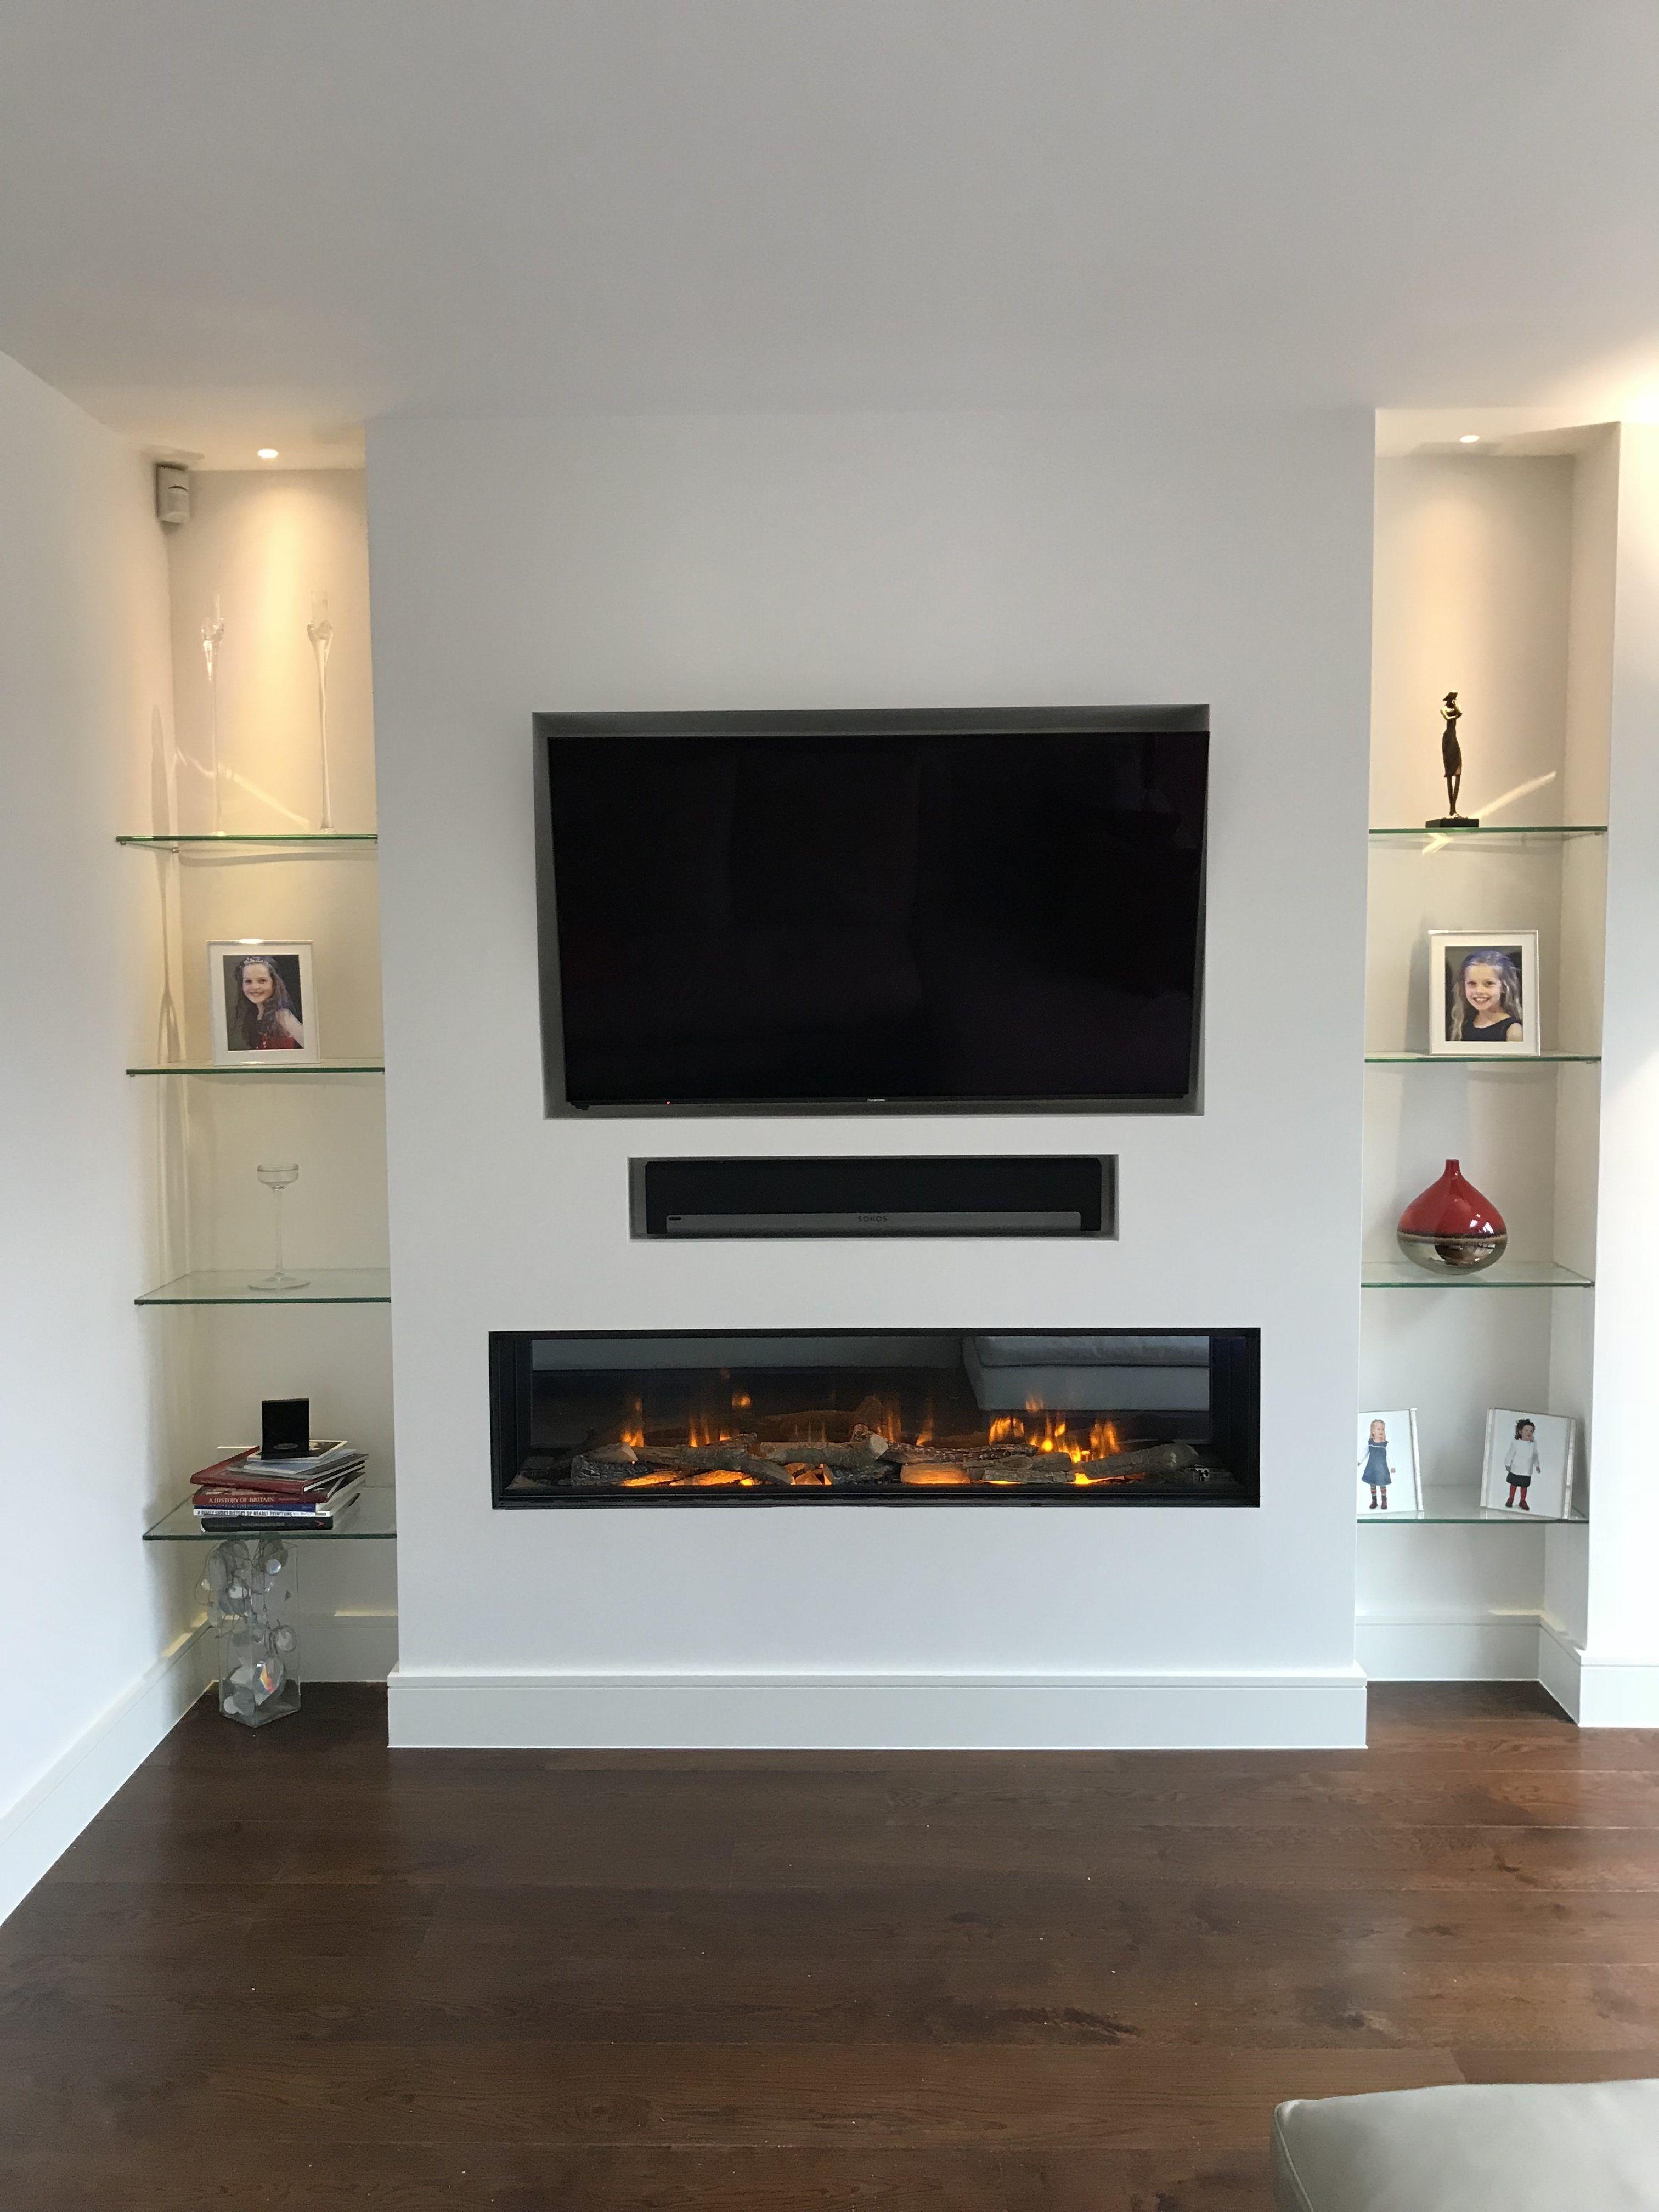 case studies  thornwood fireplaces  living room decor